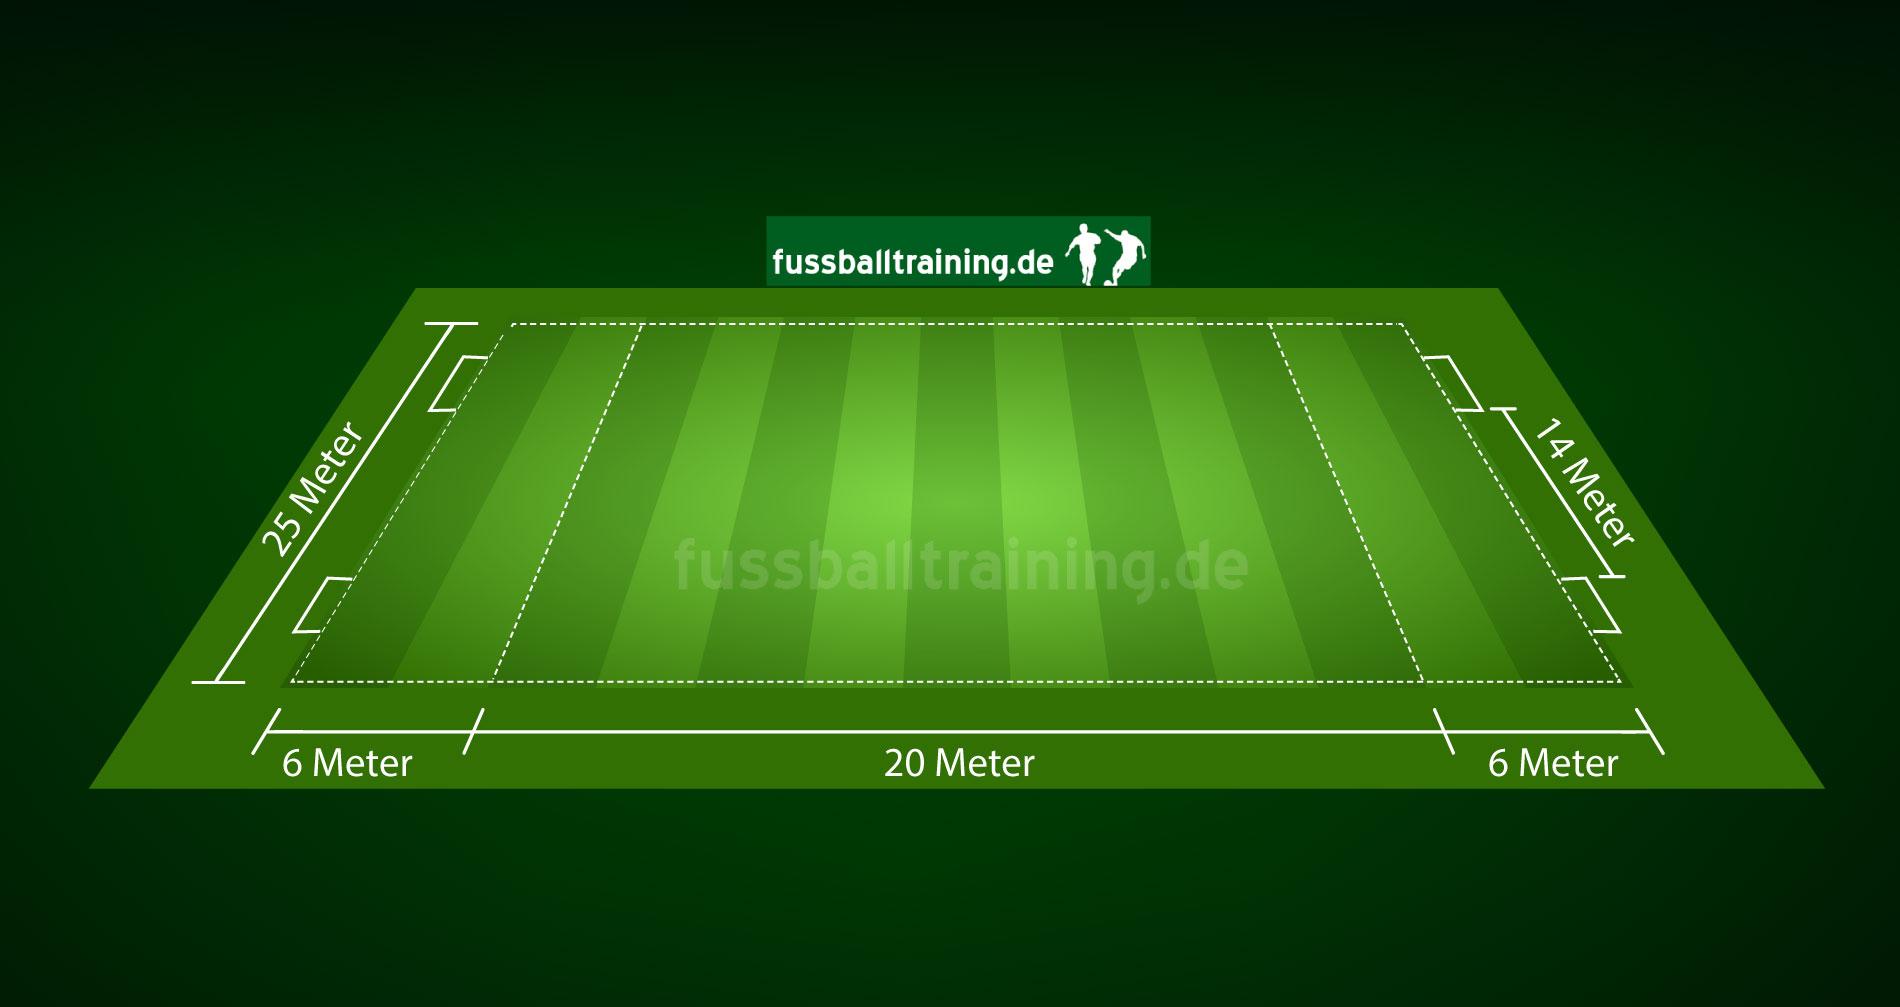 Spielfeld Funino Kinderfussball